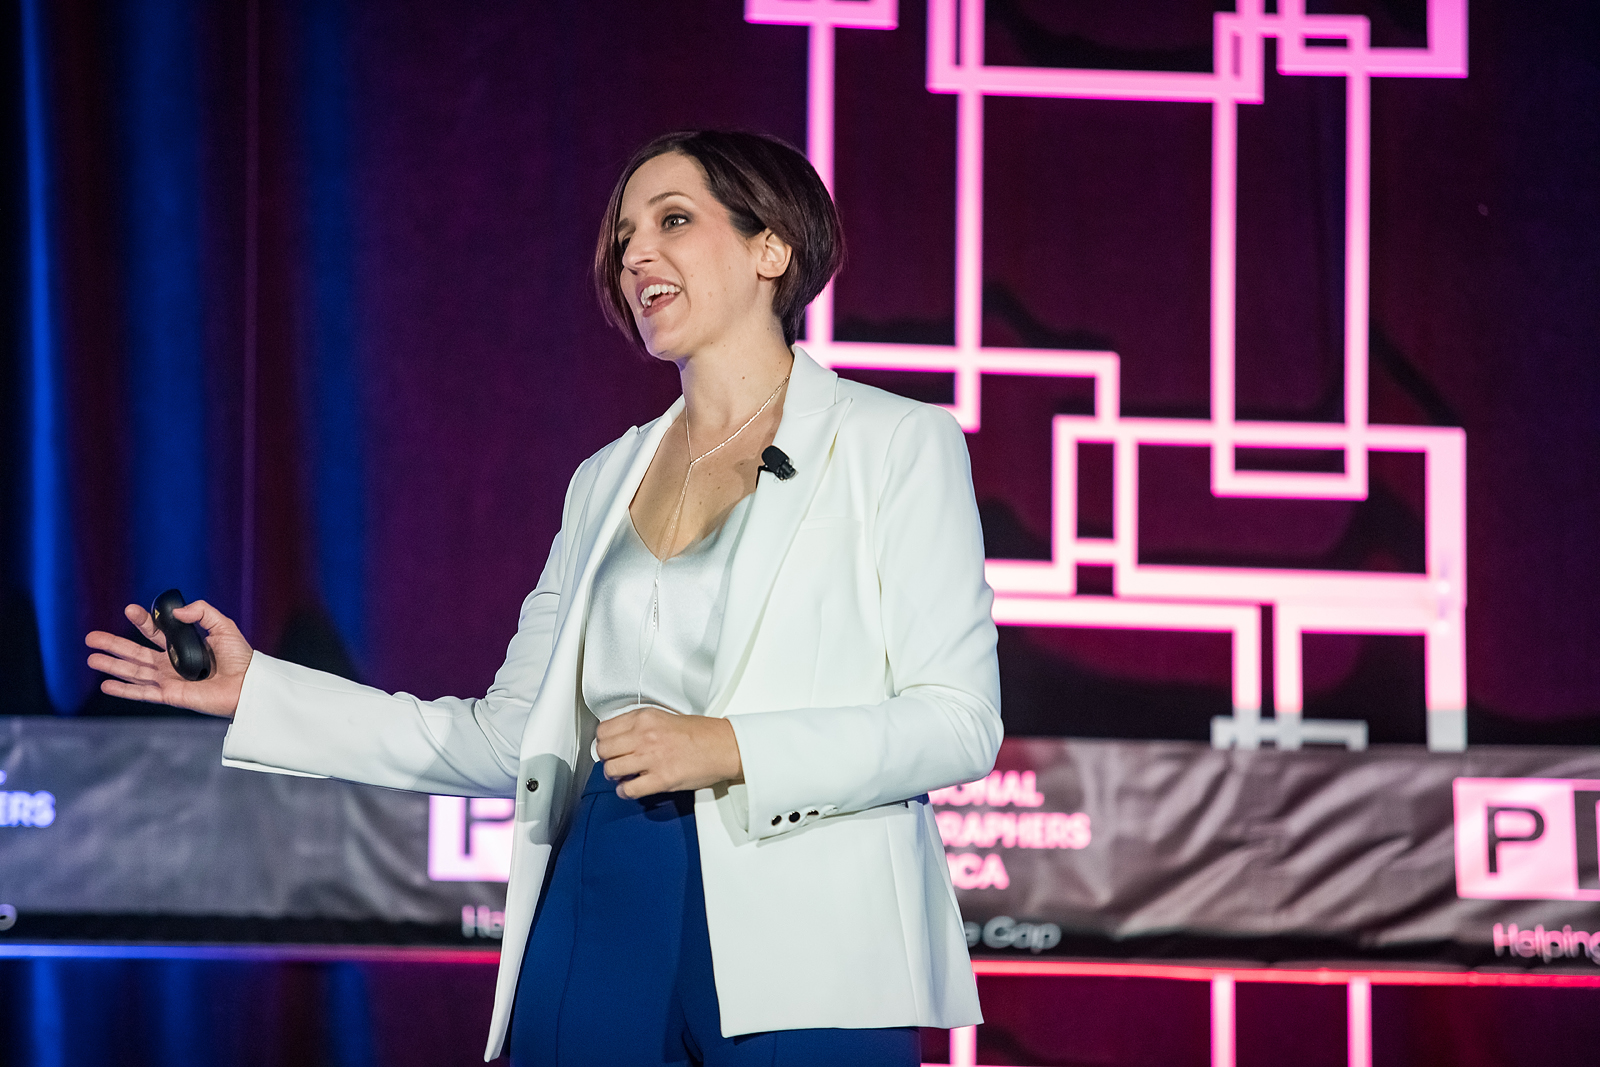 megan-dipiero-coaching-mentor-business-pricing-sales-psychology-optimism-uplifting-industry-leader.jpg